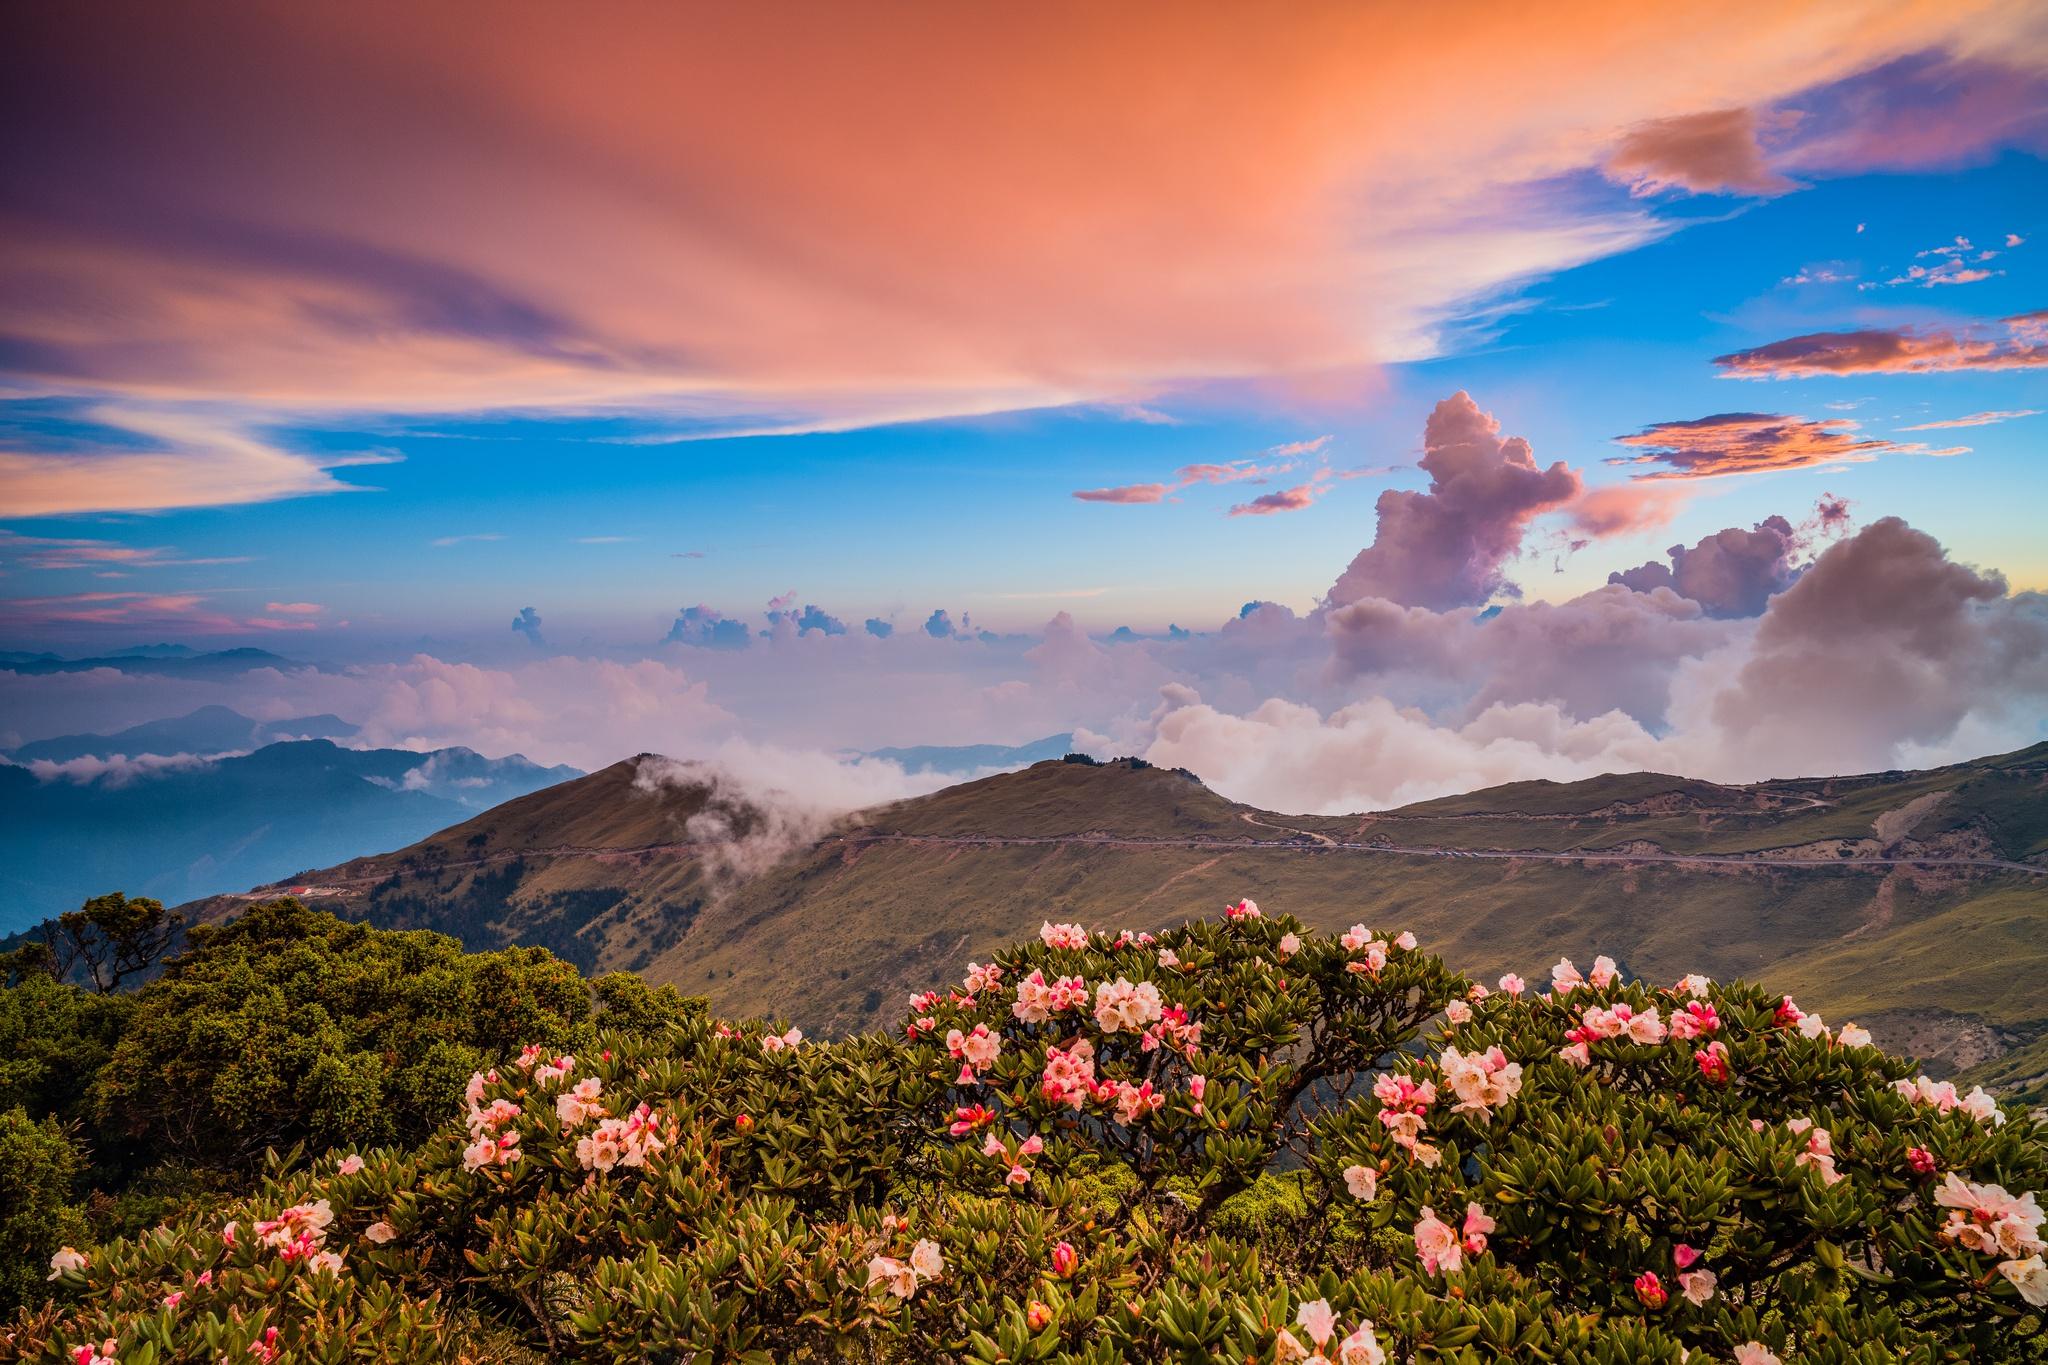 Nature Mountain Flower Cloud 2048x1365